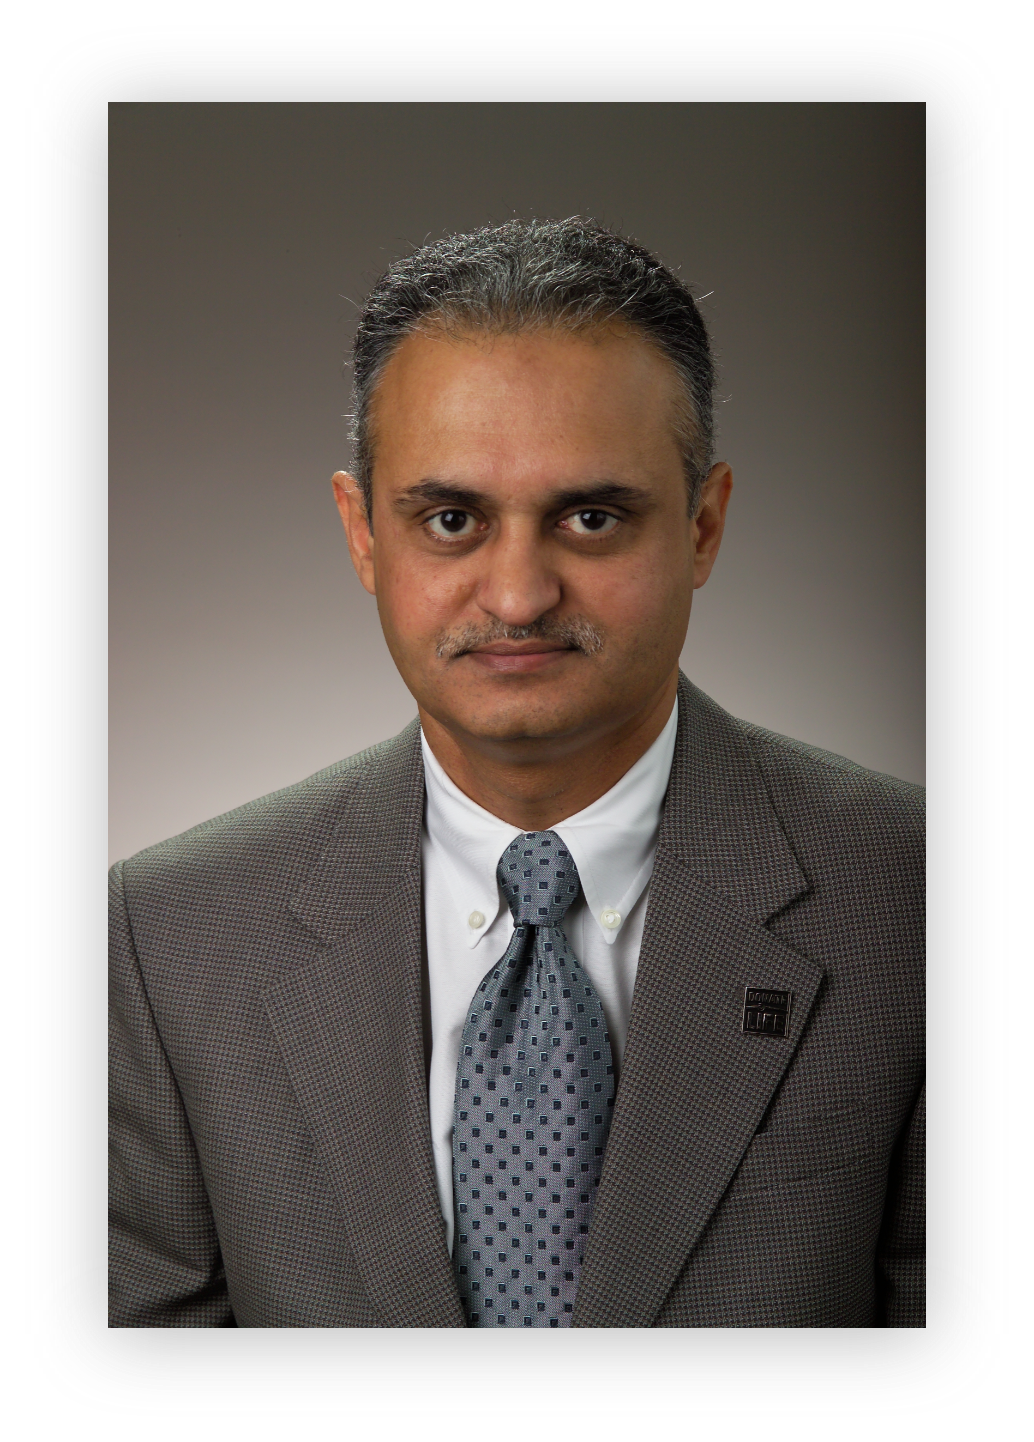 Dr. Bhargav Mistry 10-8-08 01 (1)@2x